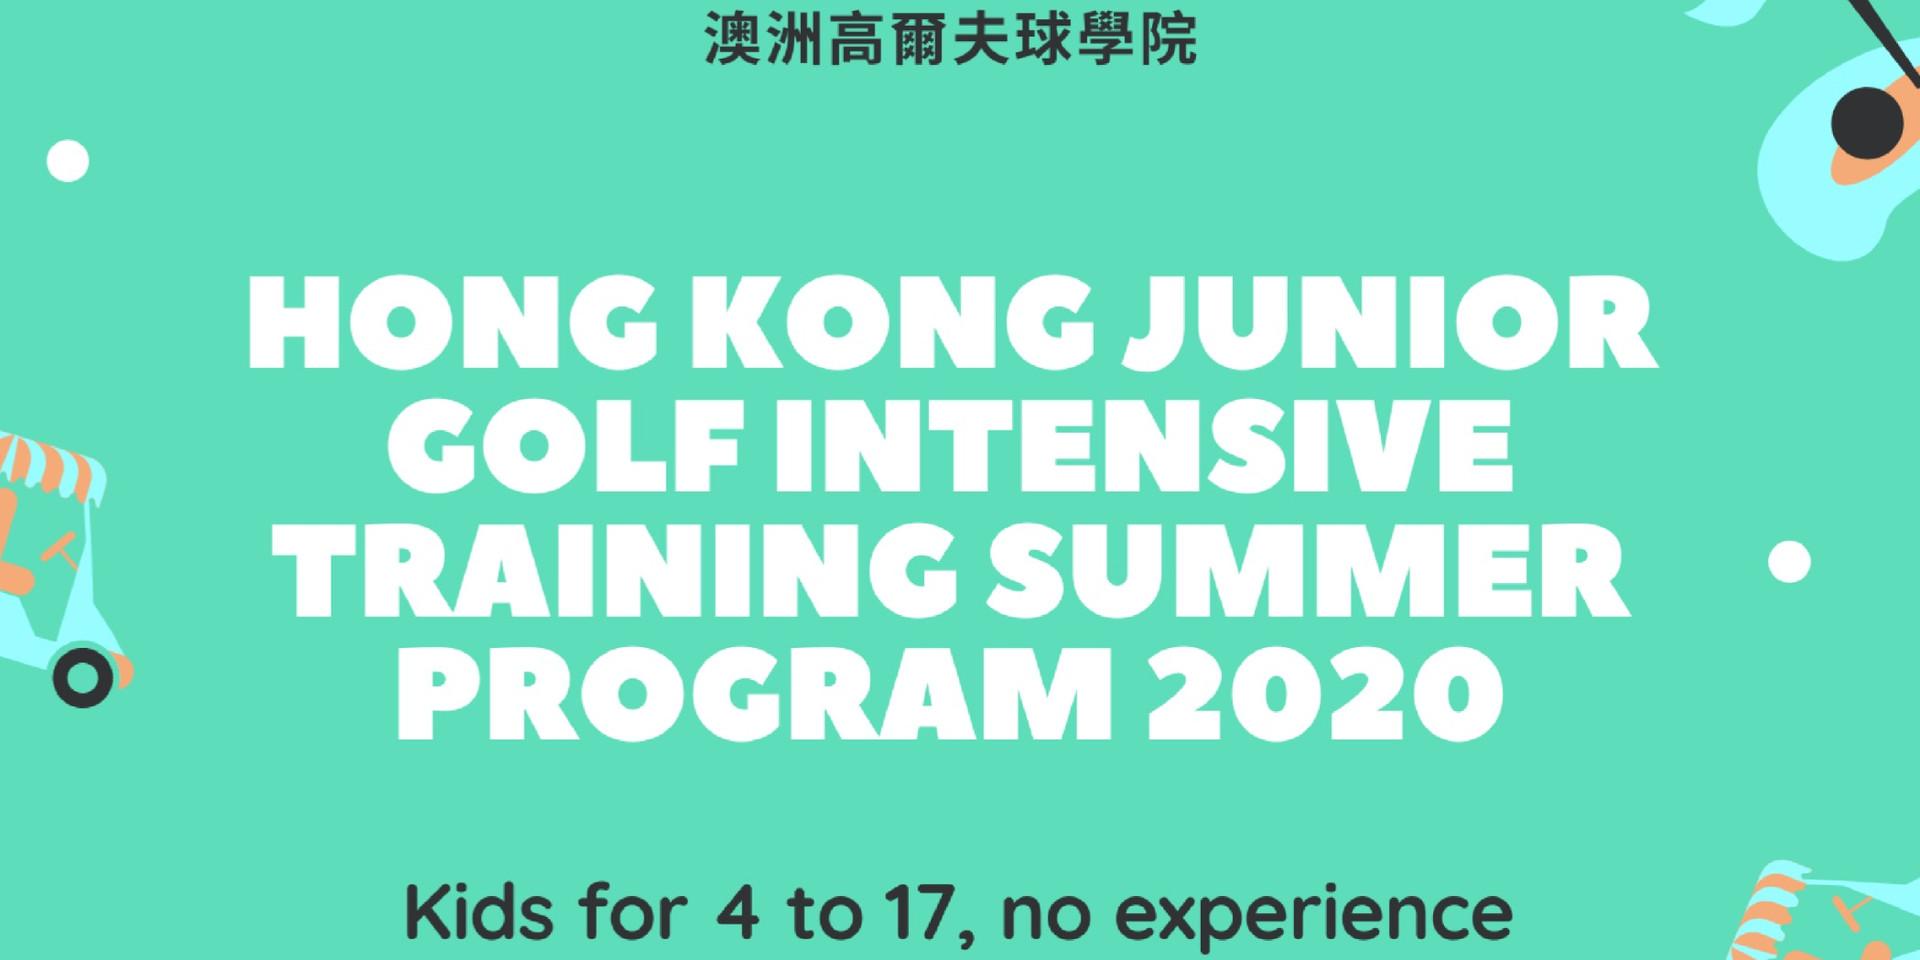 Hong Kong Junior program - trial lesson